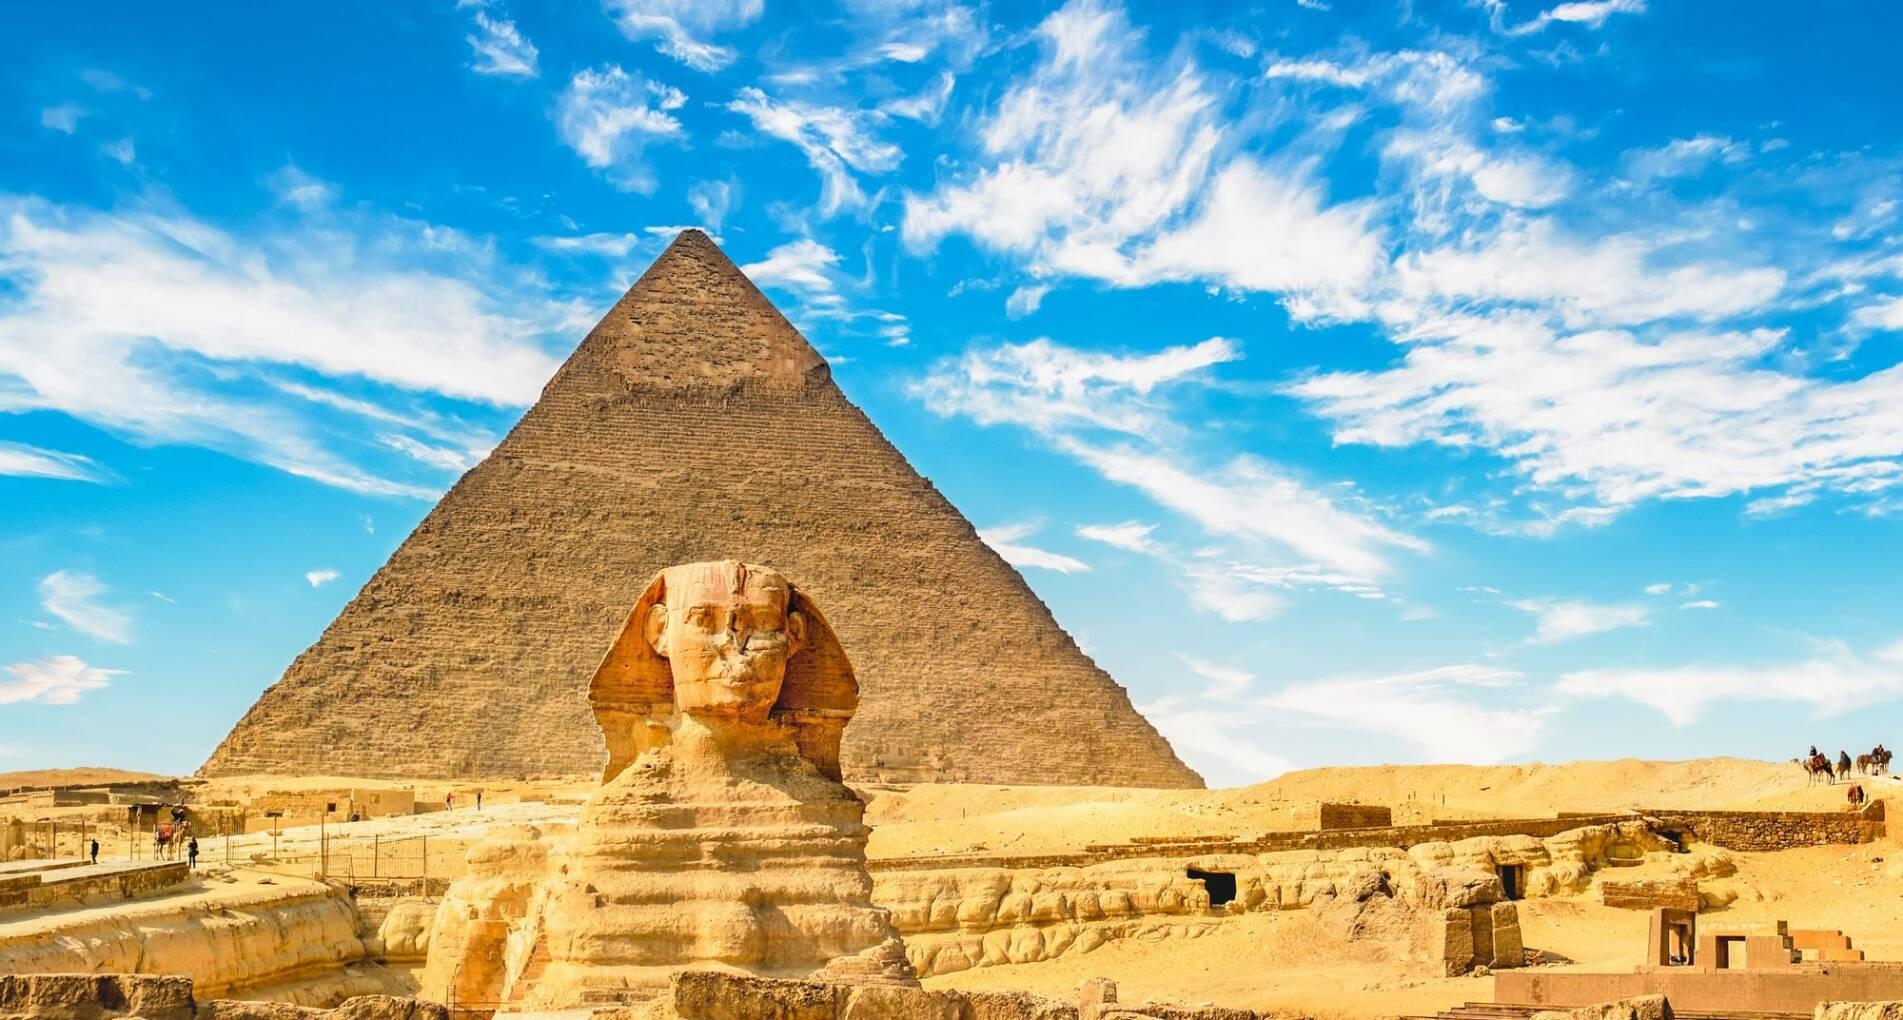 Exodusreis: In de voetsporen van Mozes - Egypte - 1